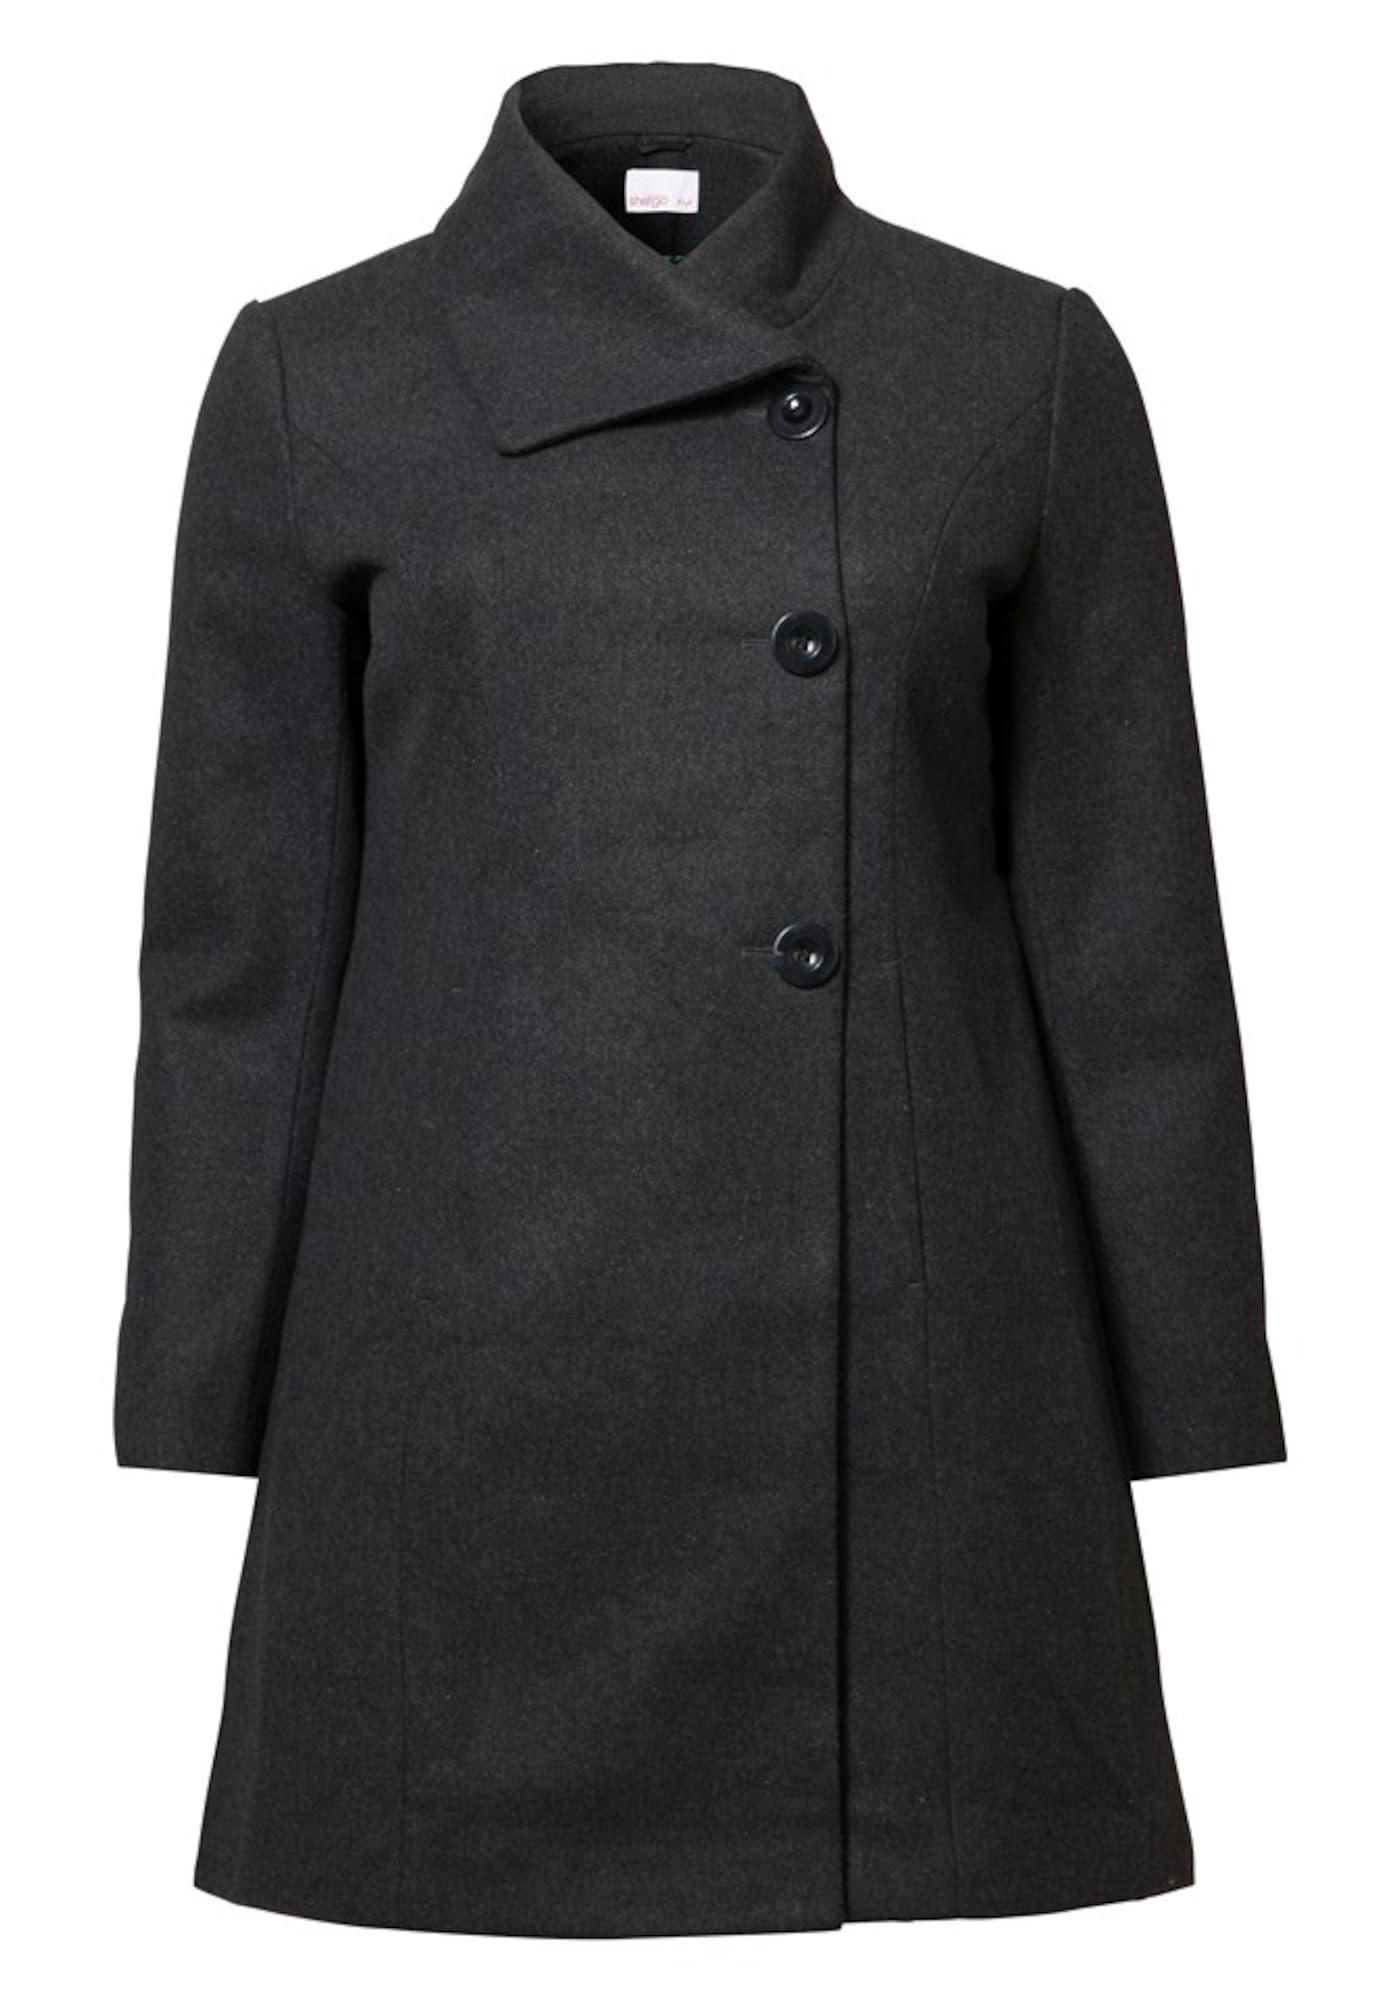 SHEEGO Demisezoninis paltas tamsiai pilka